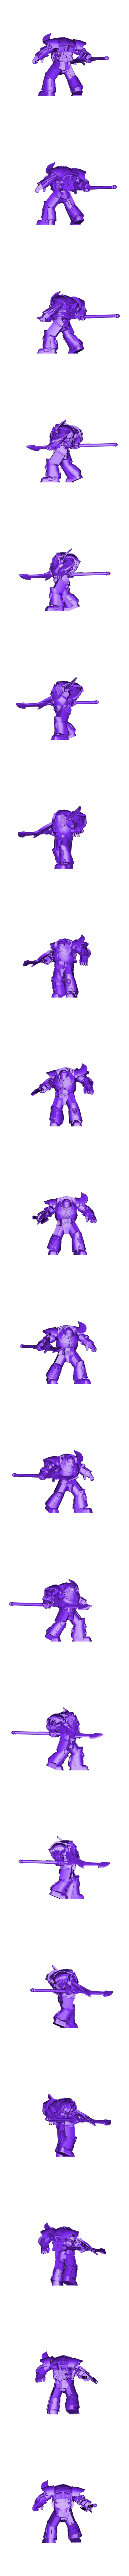 render_repaired.stl Download free STL file 1000 Followers! 3rd Legion - FireBird Terminators • 3D printing model, ThatEvilOne